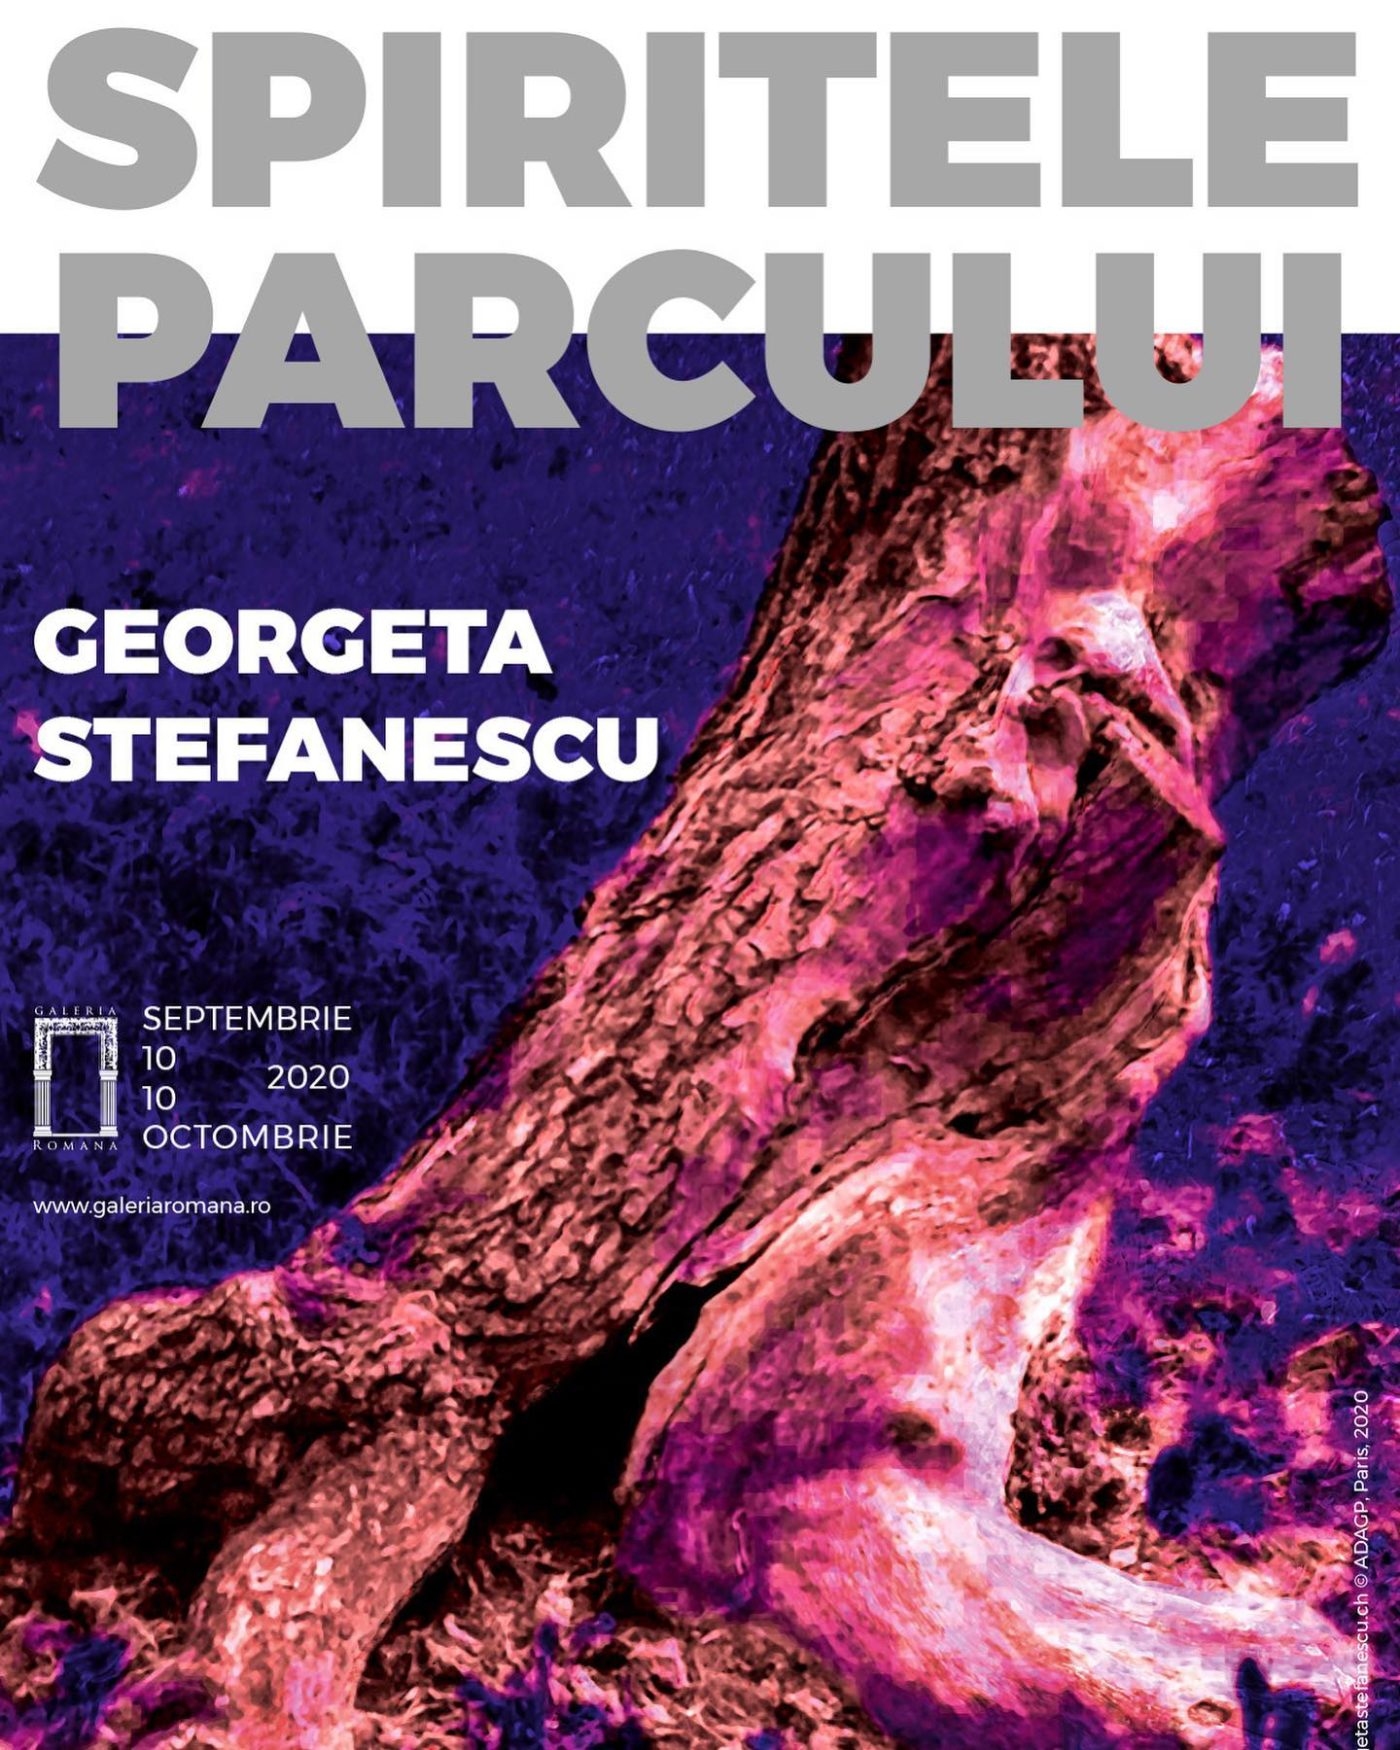 "A moment from ""Spiritele parcului"" exhibition by Georgeta Stefanescu @ Galeria Romana"